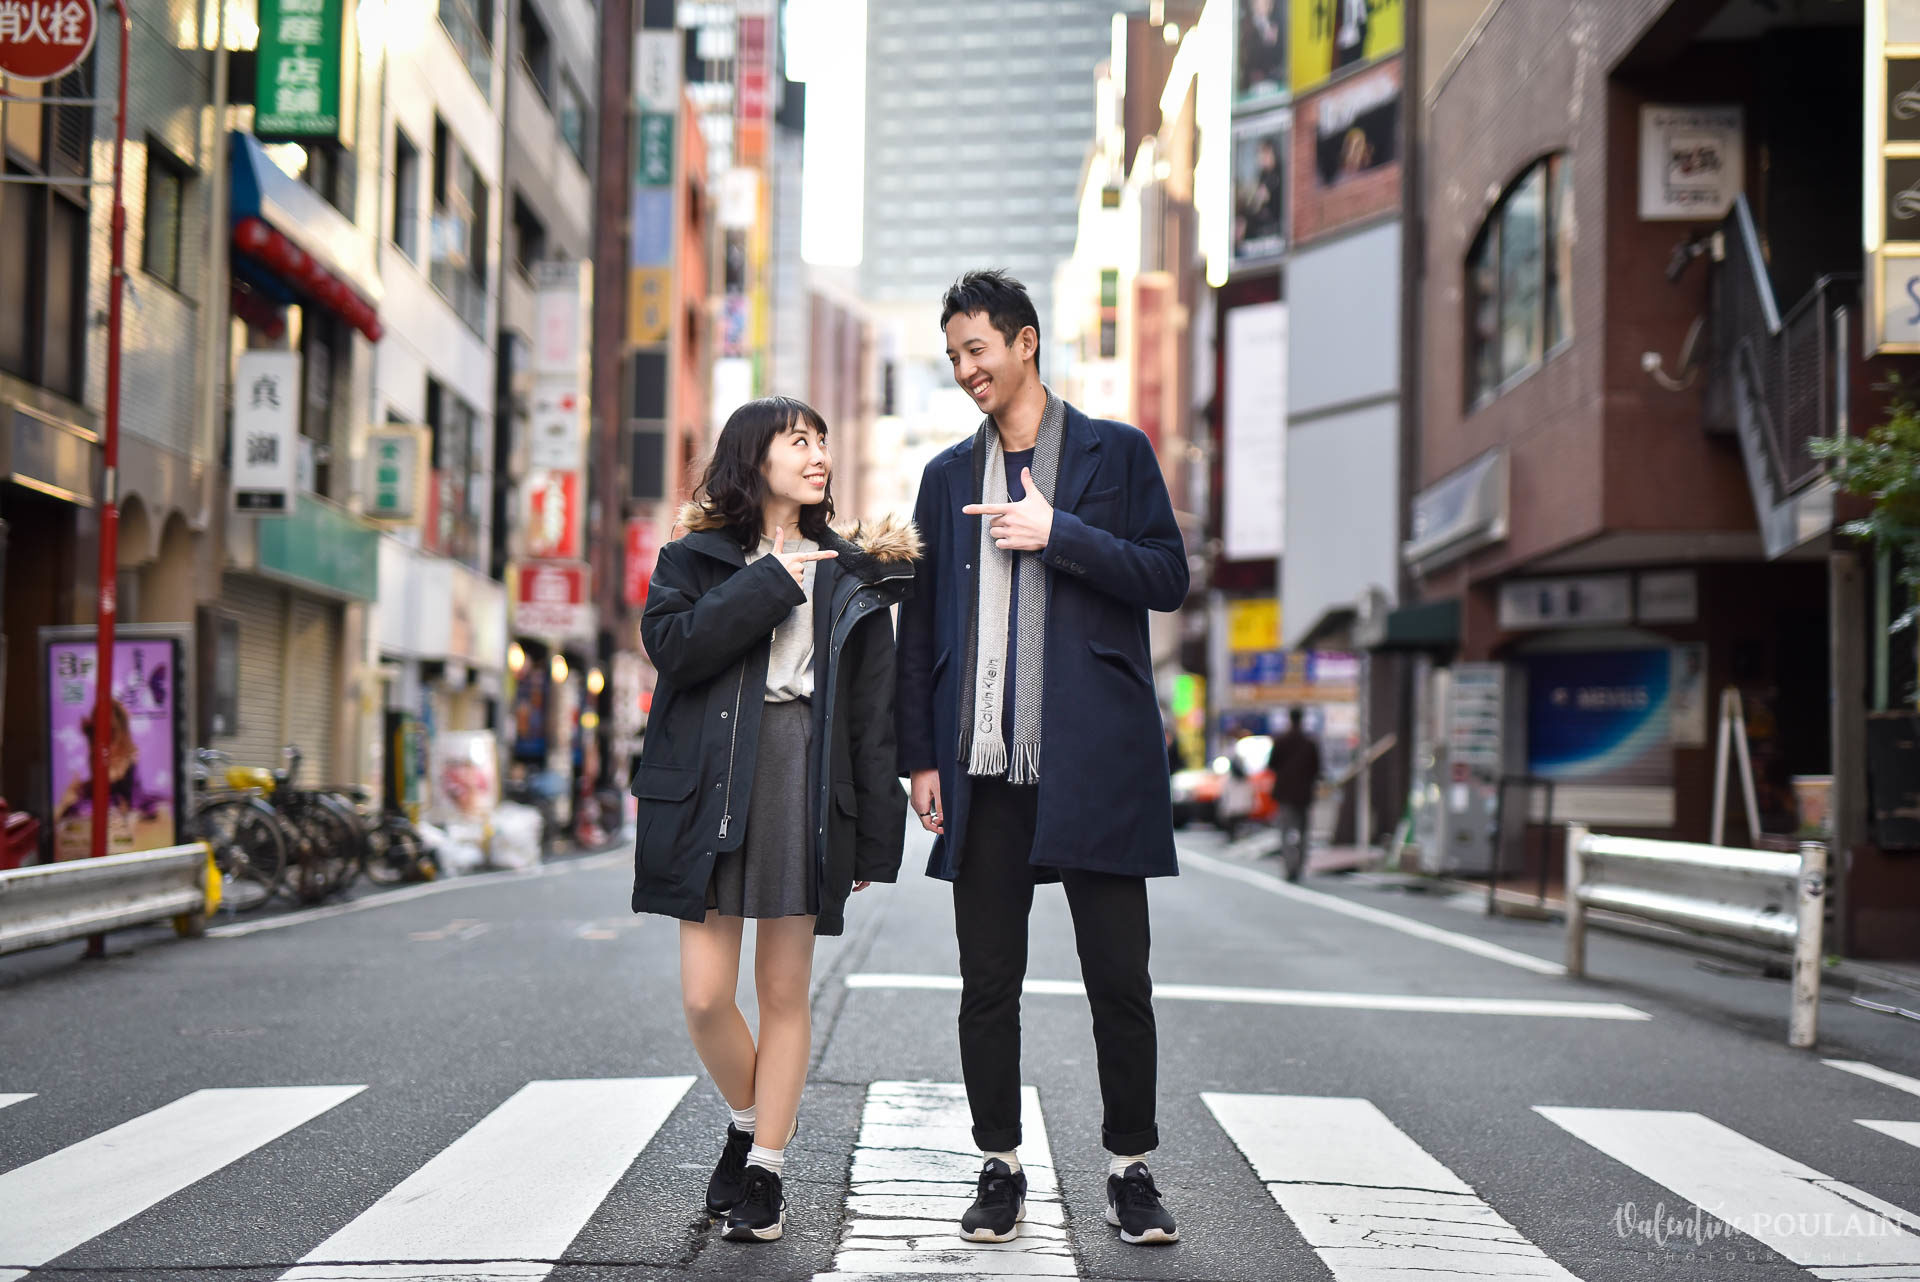 Shooting couple Japon Tokyo - Valentine Poulain street